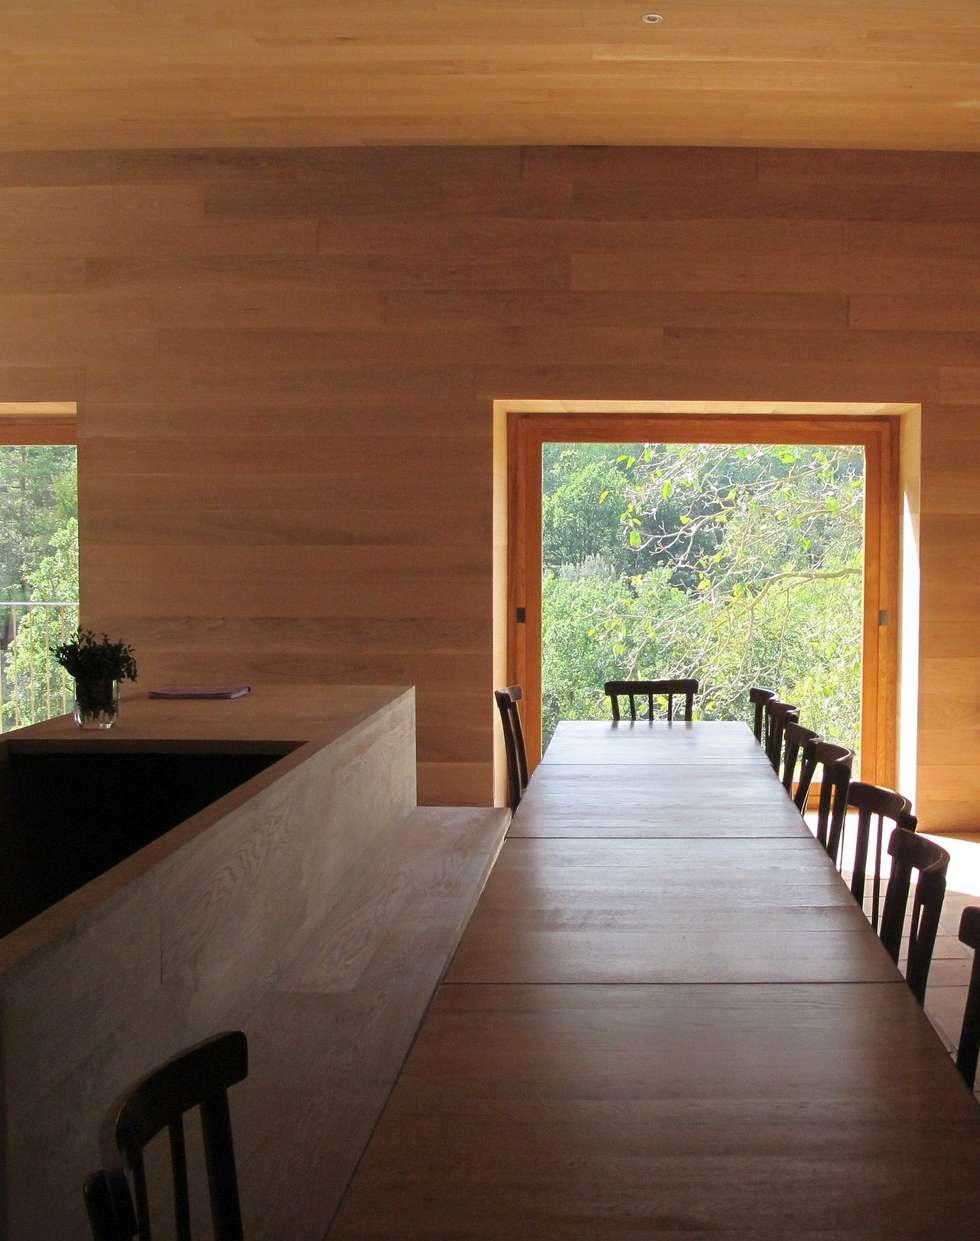 Fotos de decora o design de interiores e reformas homify for Titulo decorador de interiores